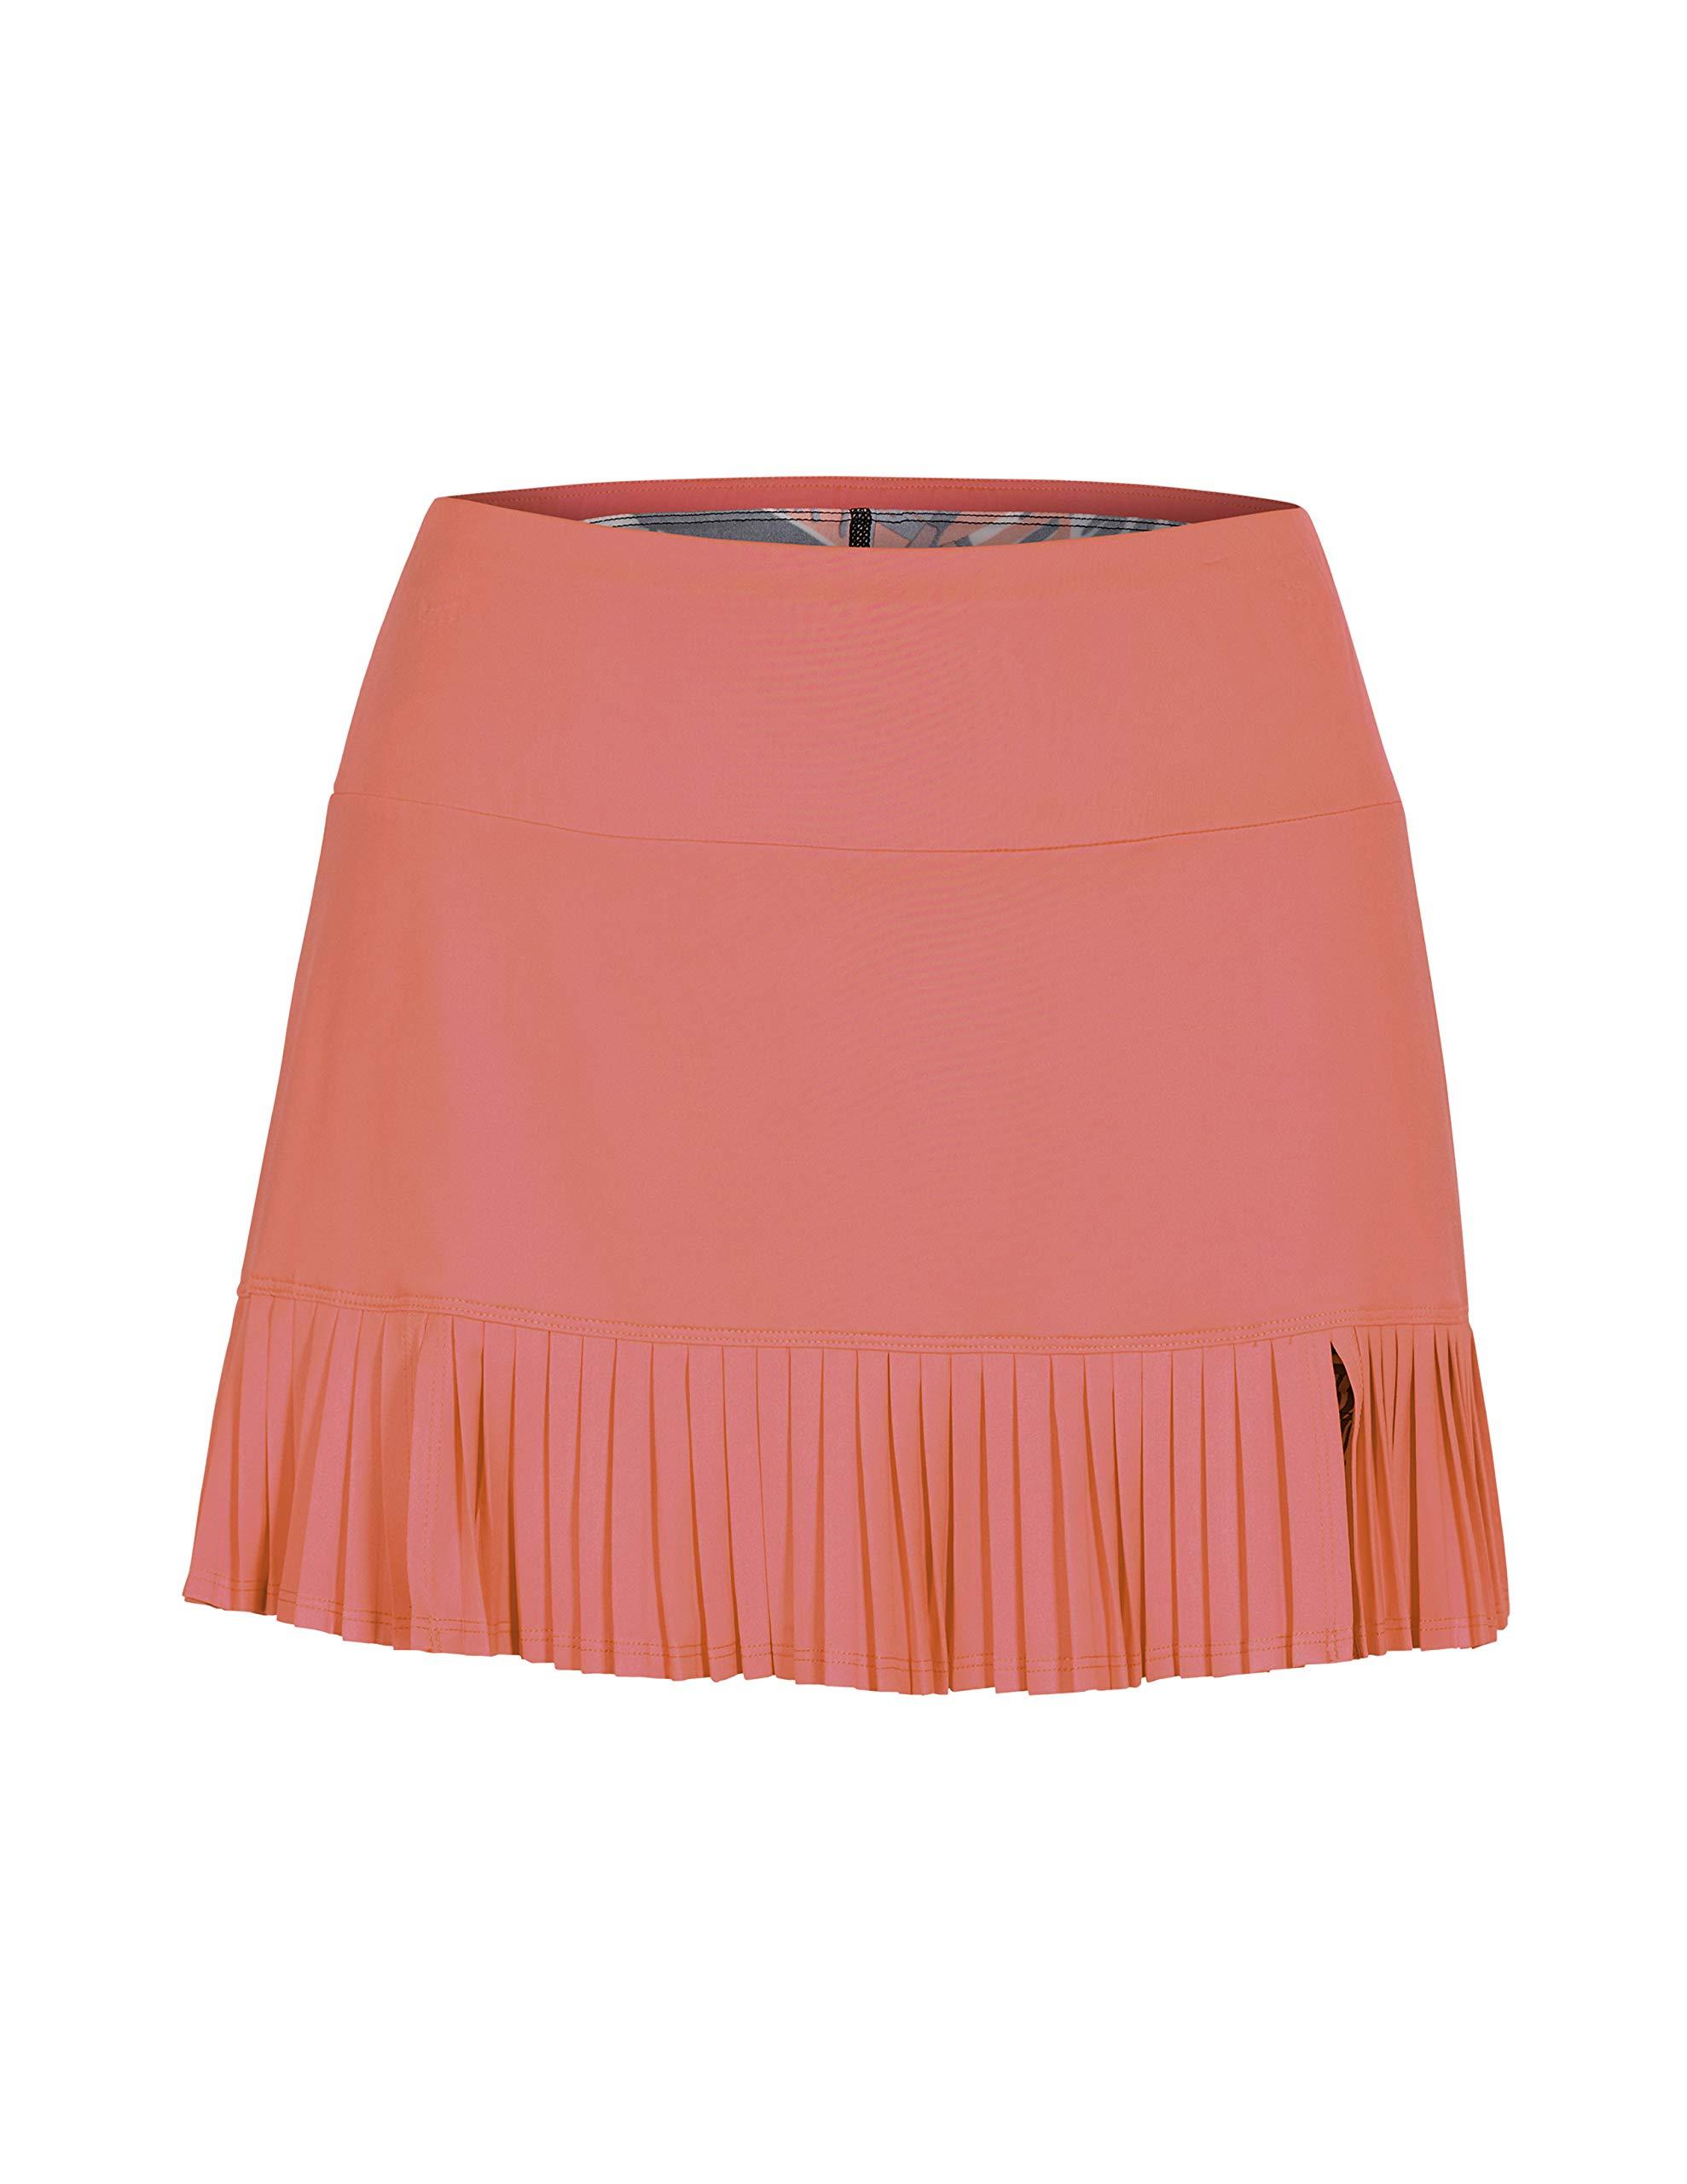 Tail Tropic Sunrise Micro Pleated Skirt (Small)